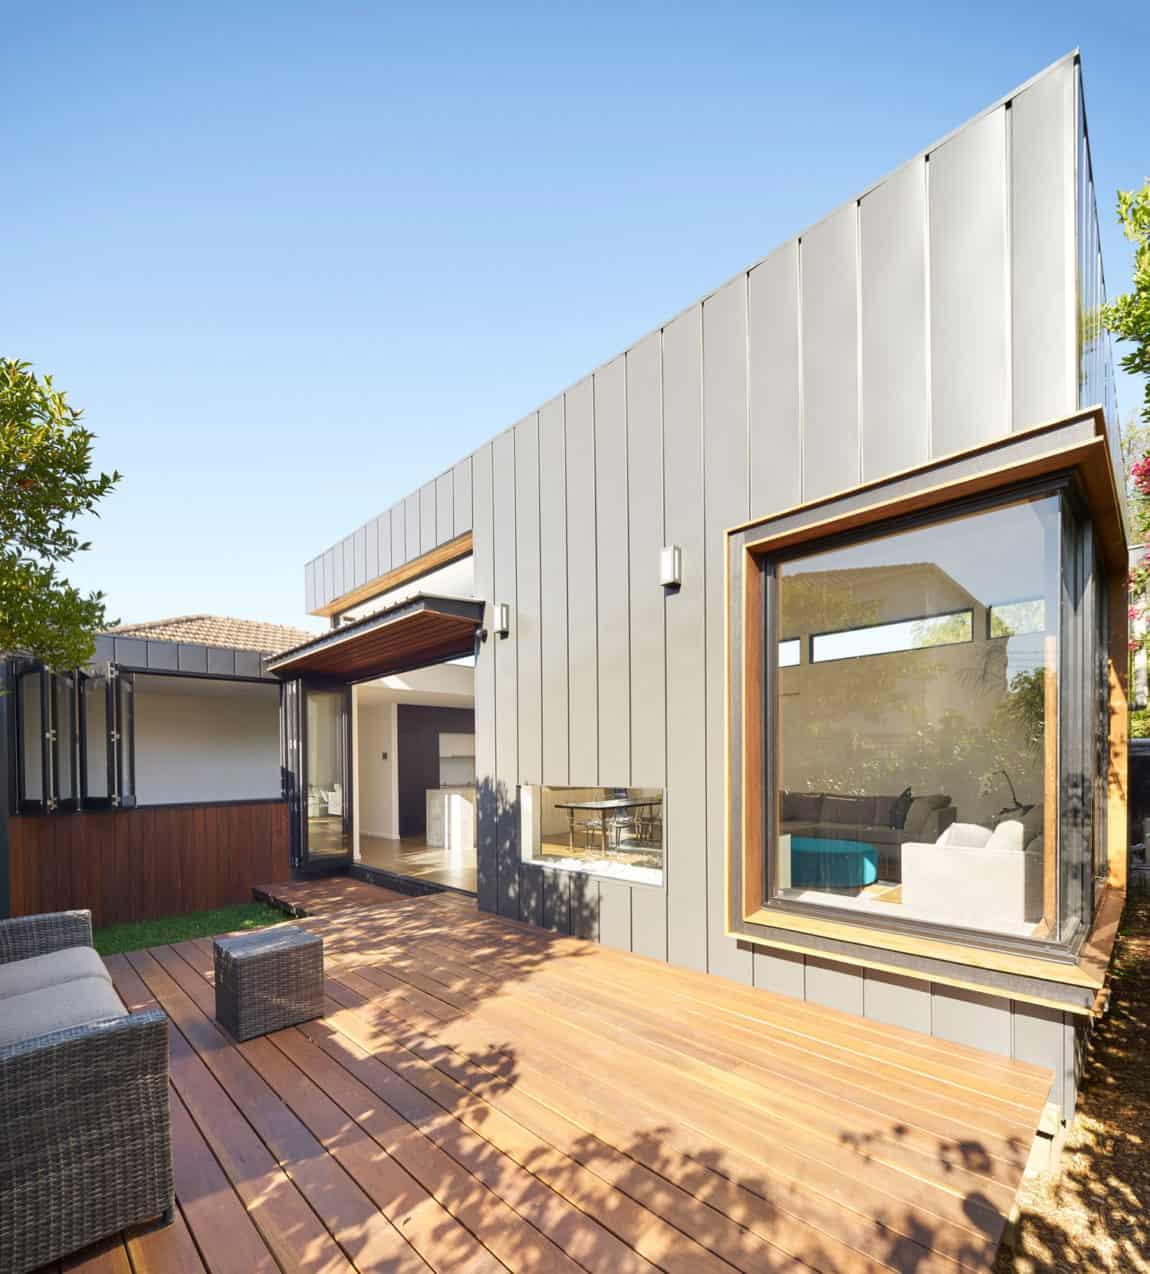 Cumquat Tree House by Christopher Megowan Design (1)